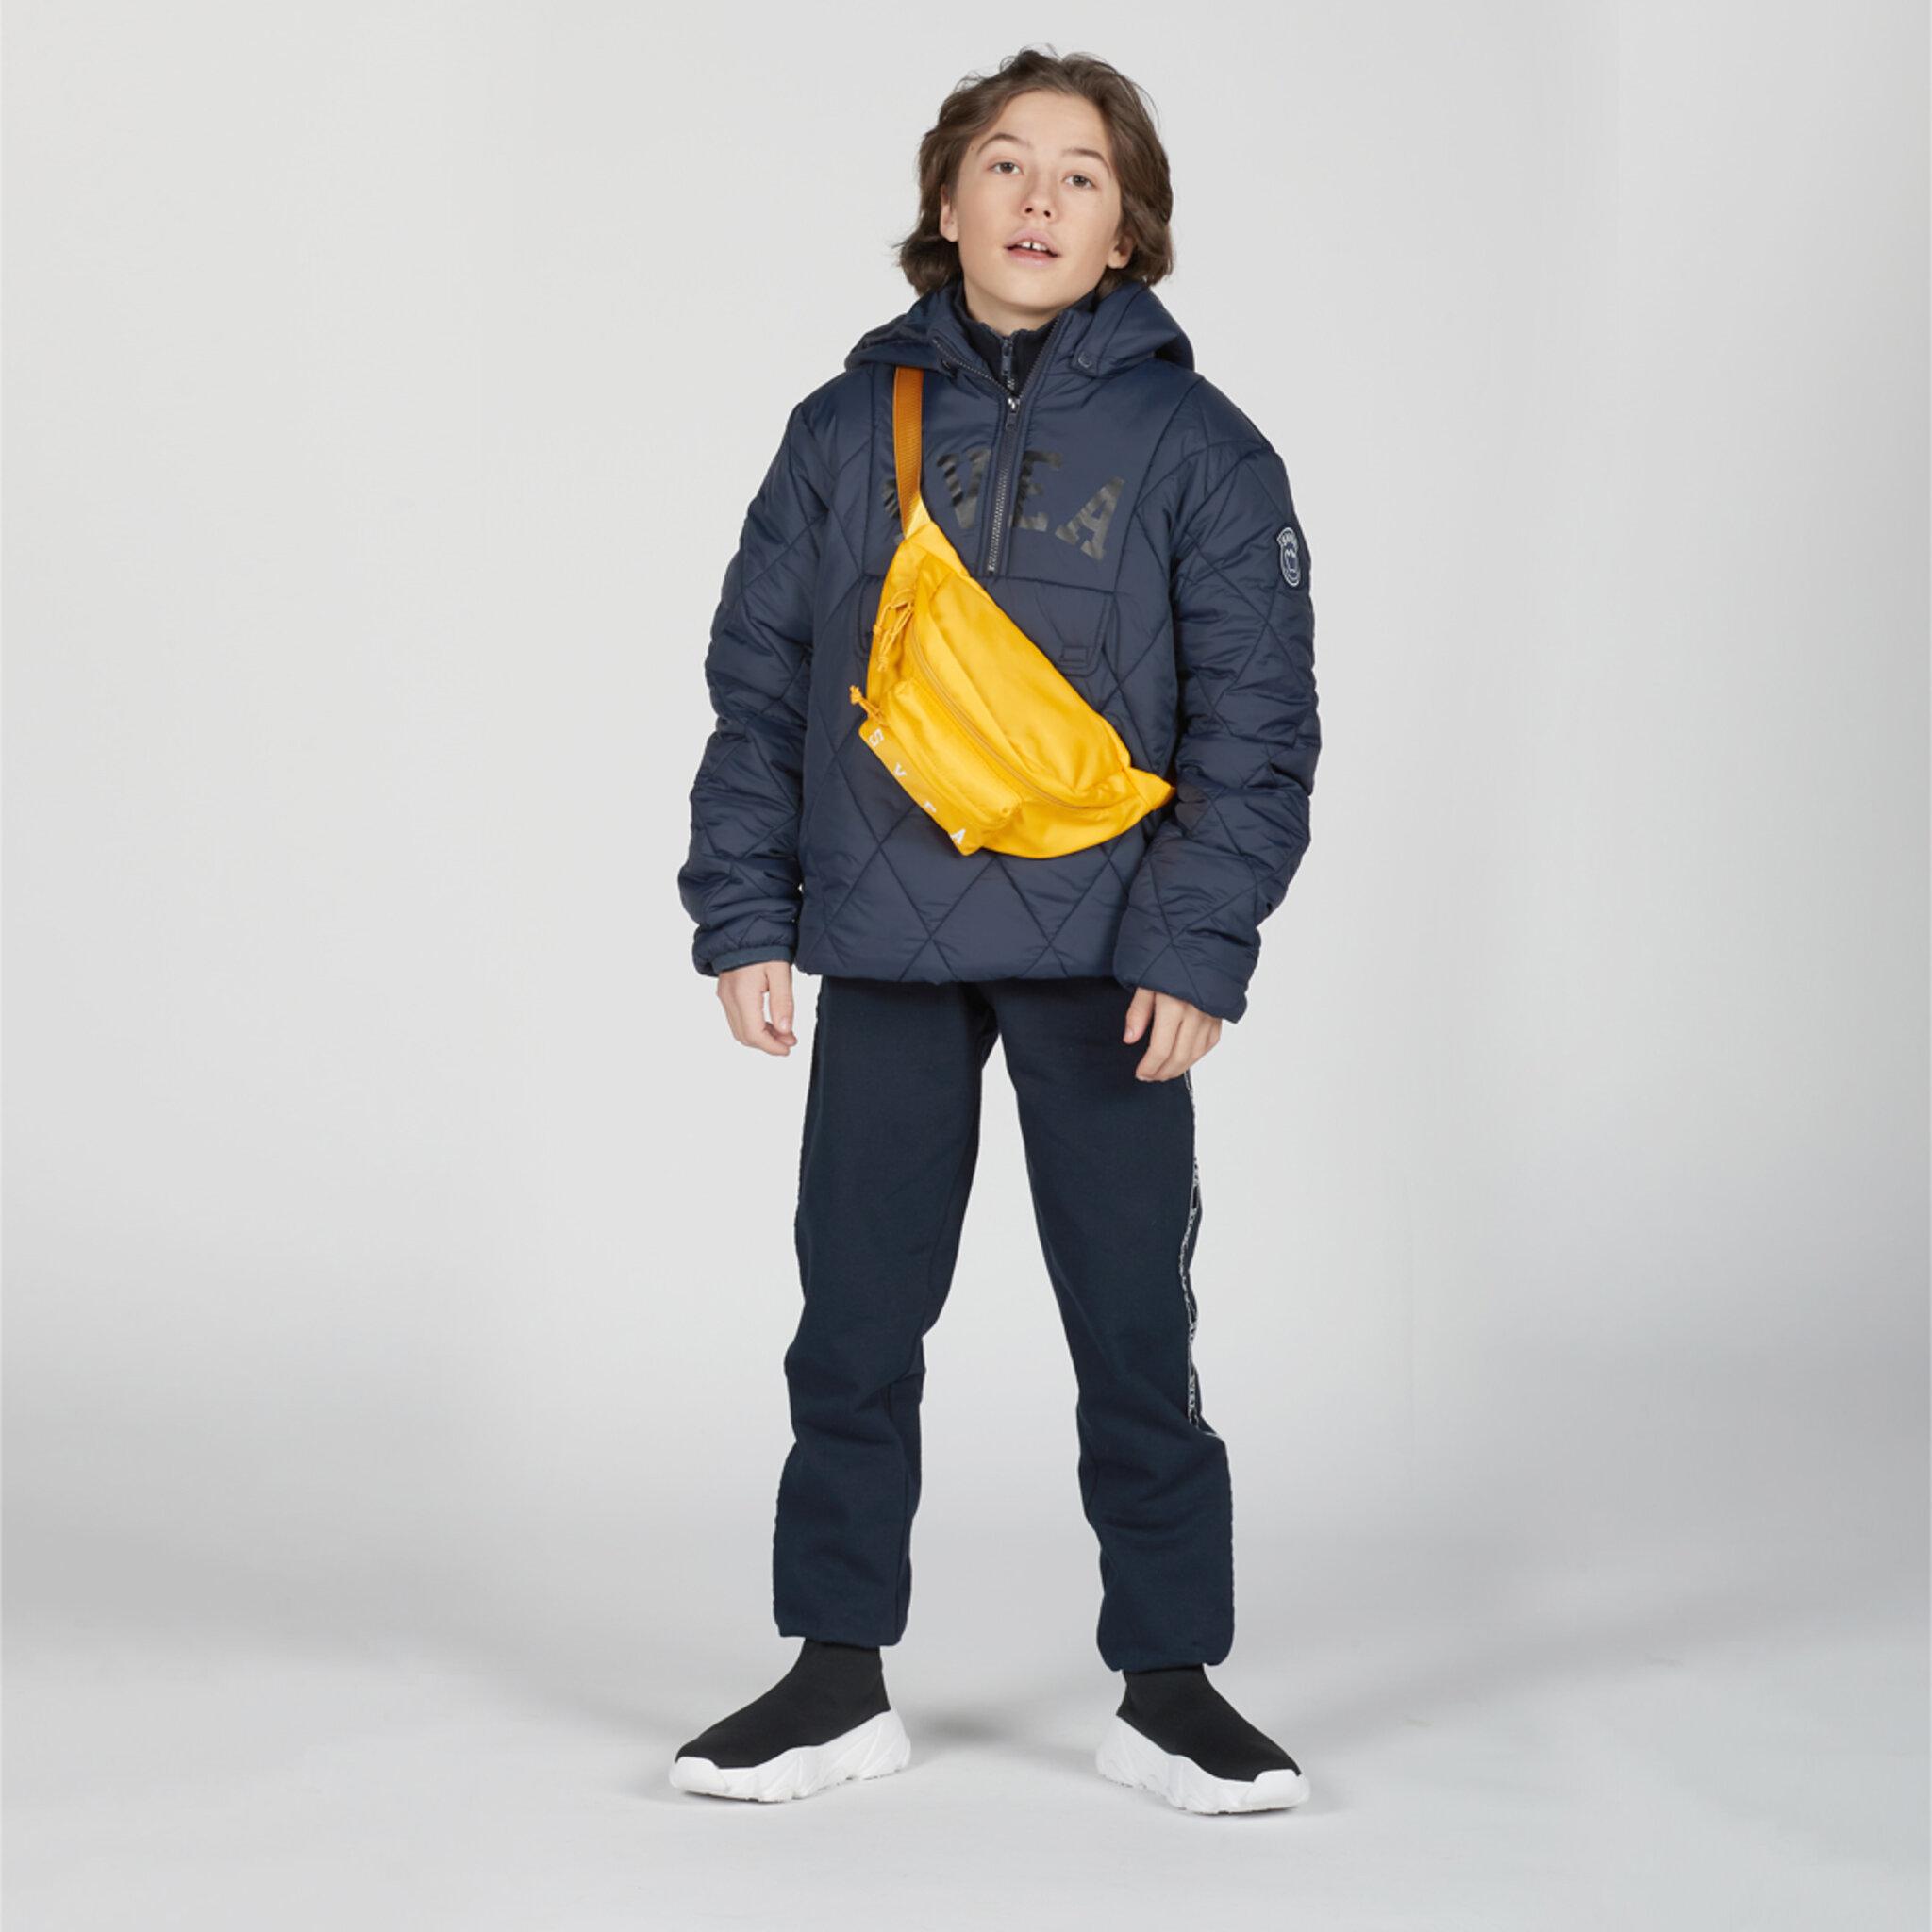 K. Quilted Anorak Hood Jacket